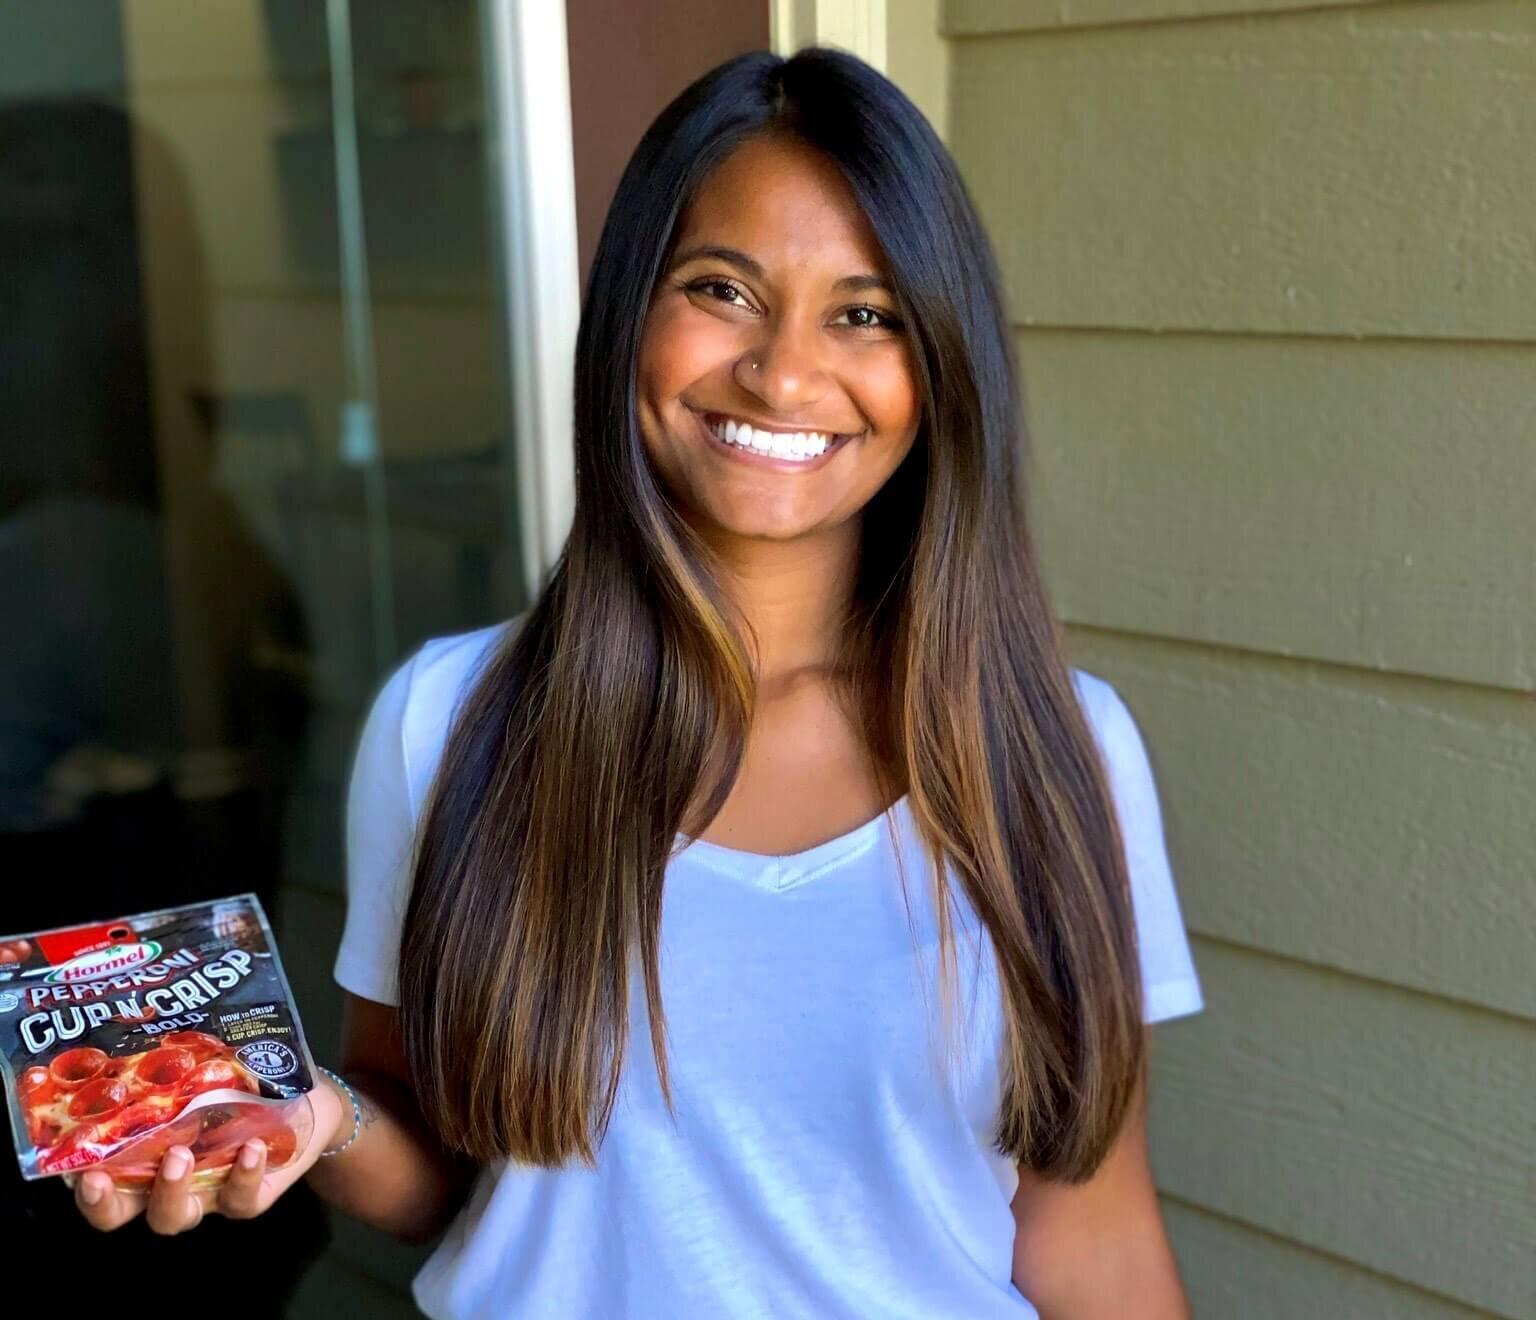 Sneha Jogi holding Hormel pepperoni